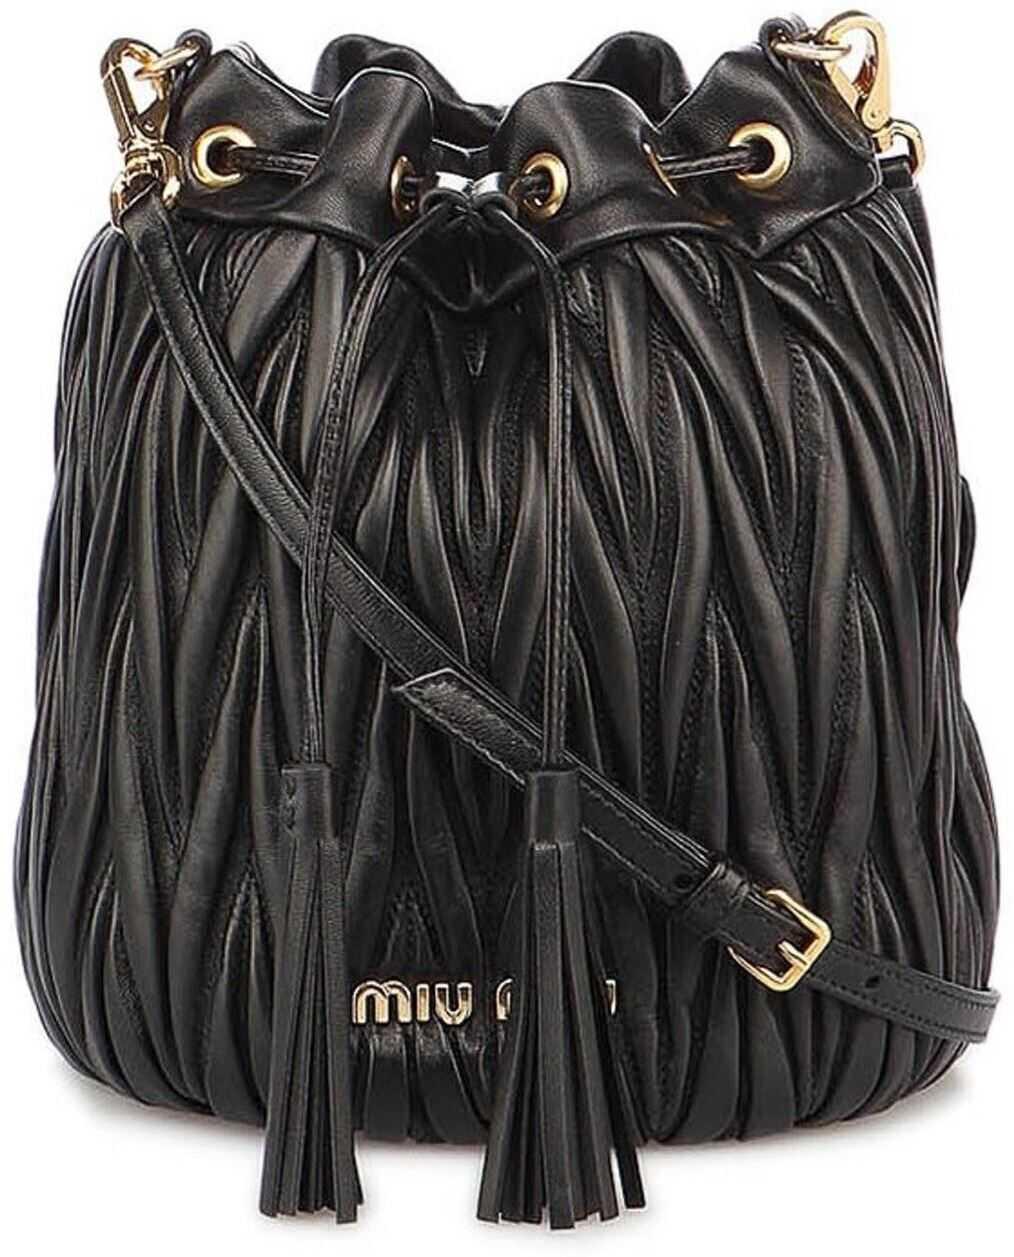 Miu Miu Matelassé Nappa Bucket Bag In Black 5BE014N88VOOOF0002 Black imagine b-mall.ro